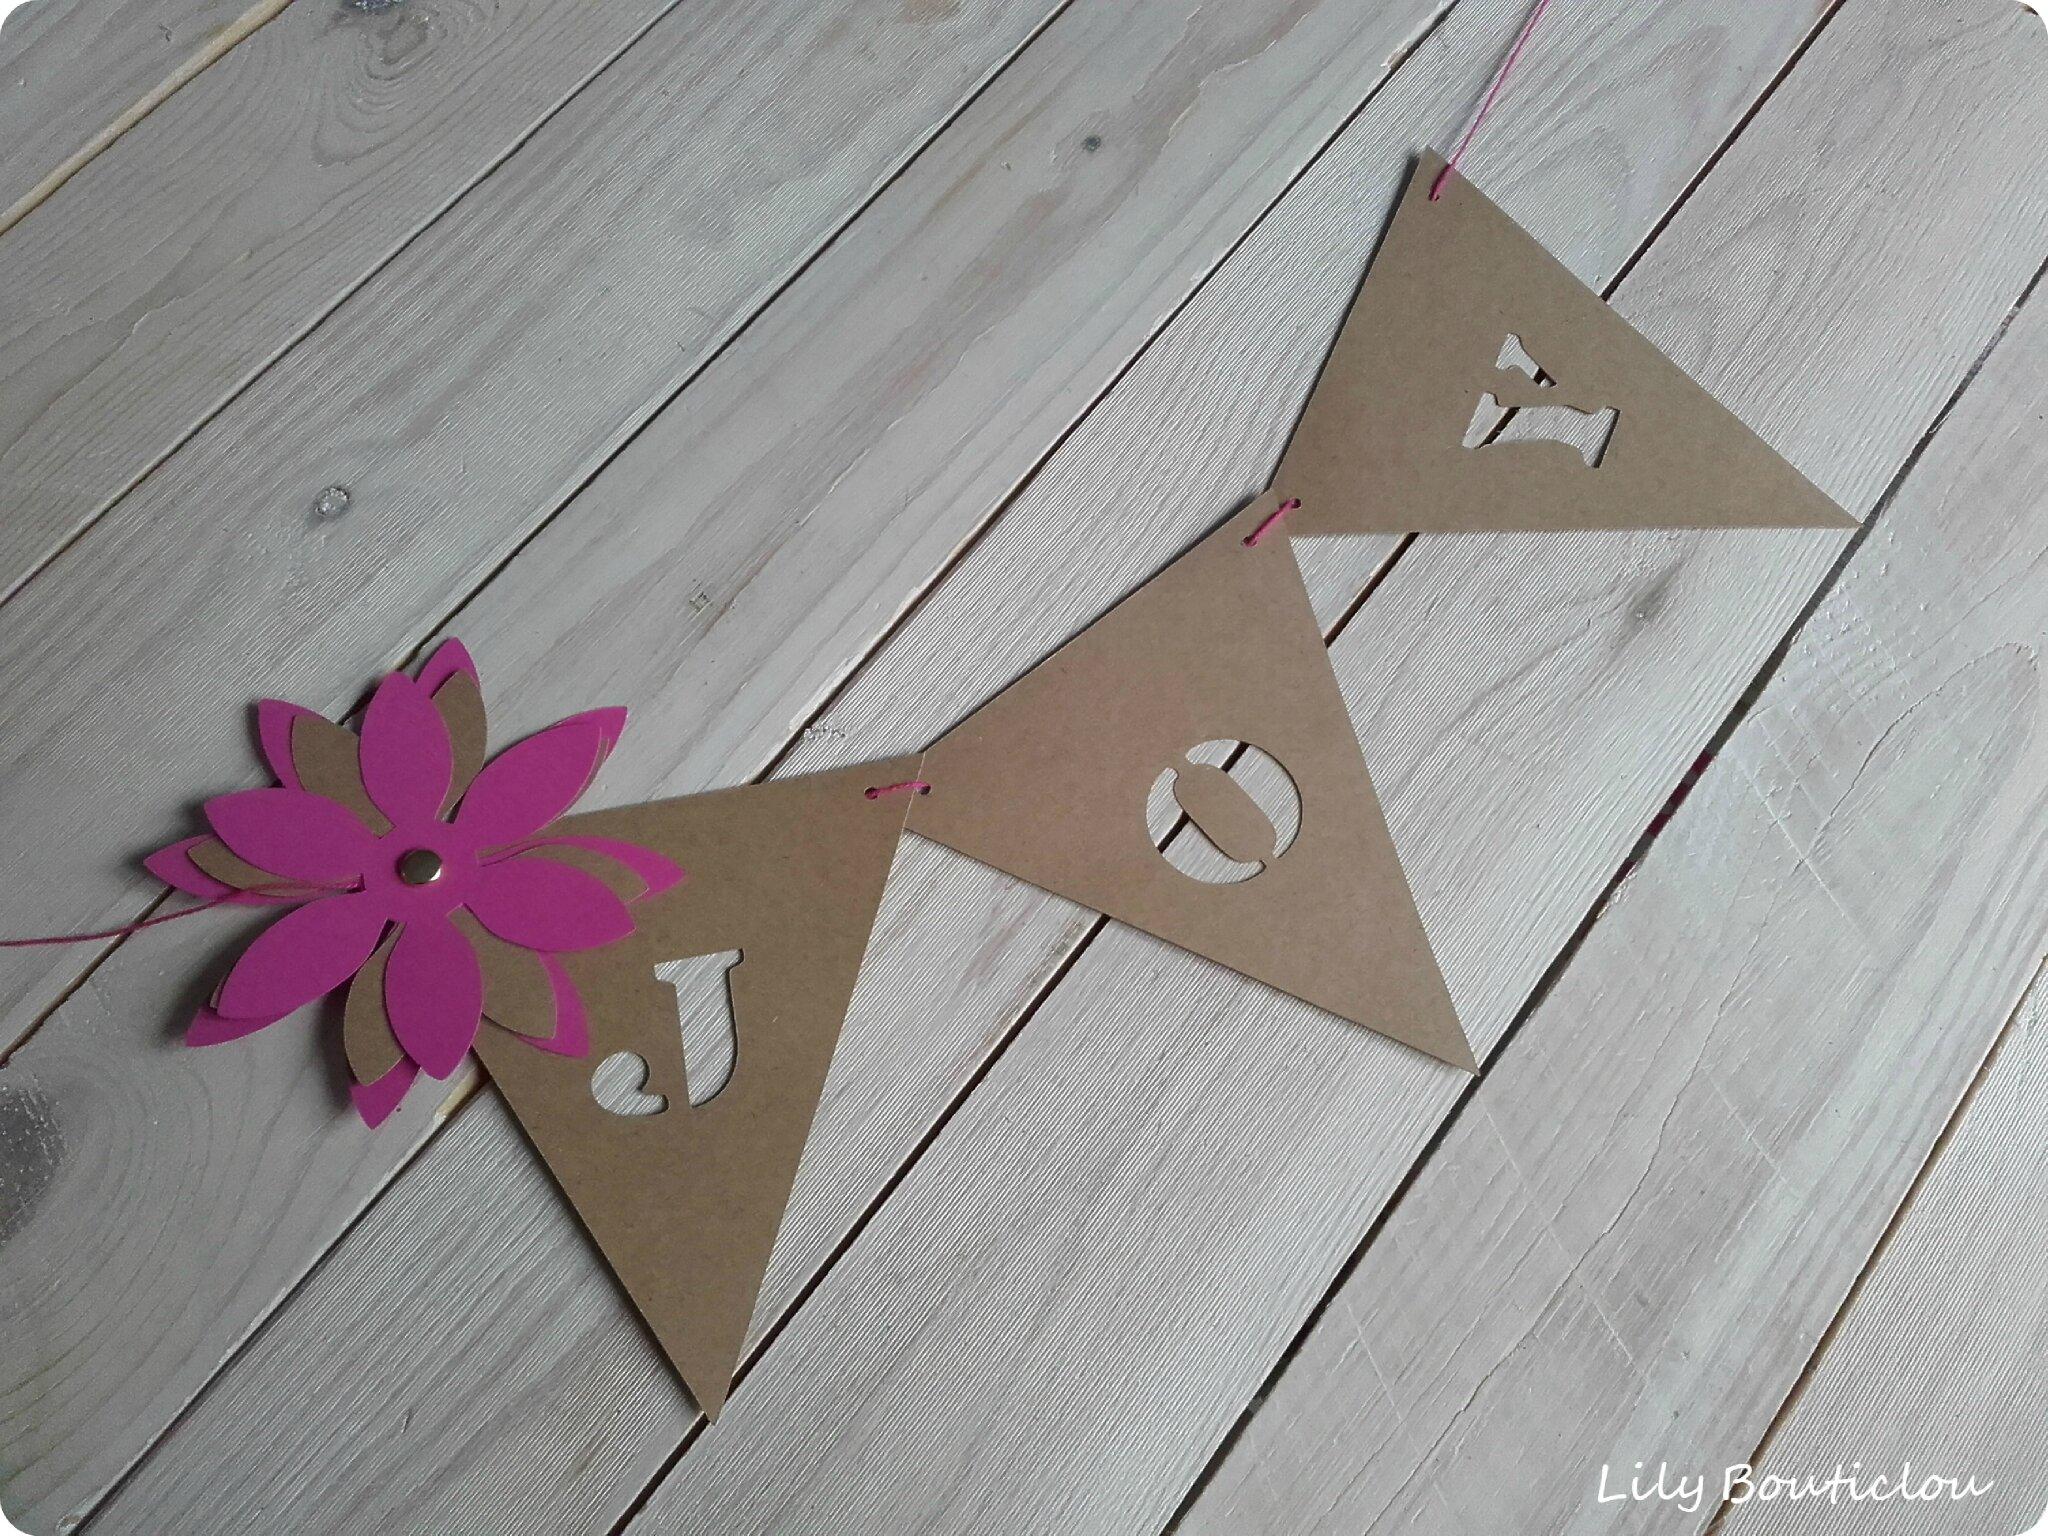 guirlande fanions carton pennant garland cardboard joy silhouette cameo lilybouticlou